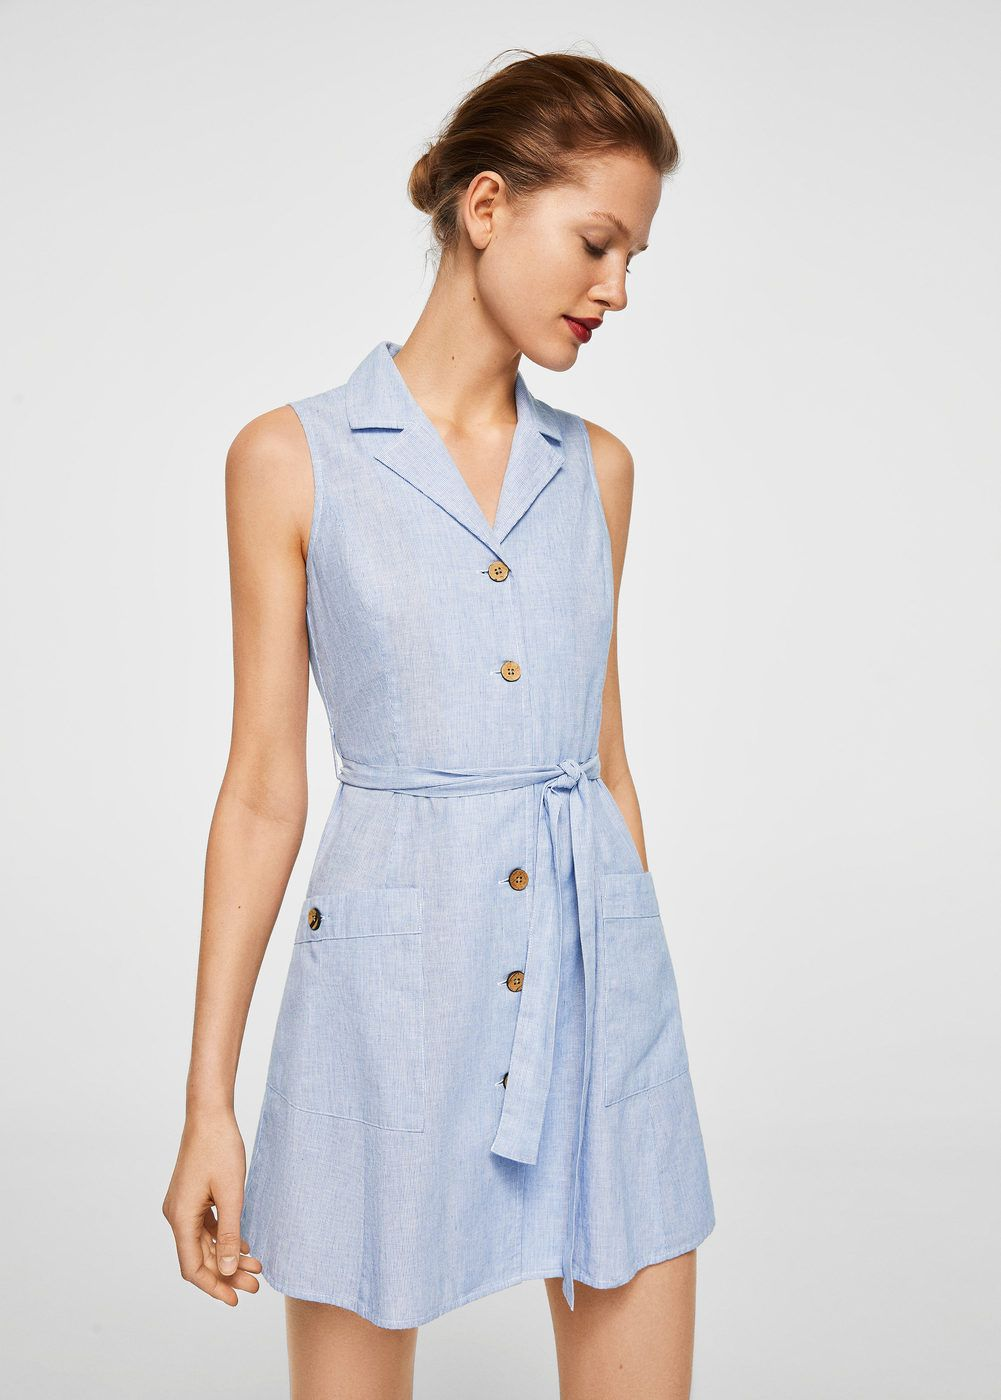 bb1ab4dcd8670 Kemerli koton elbise - Elbise - Kadın | vacation | Dresses, Blue ...